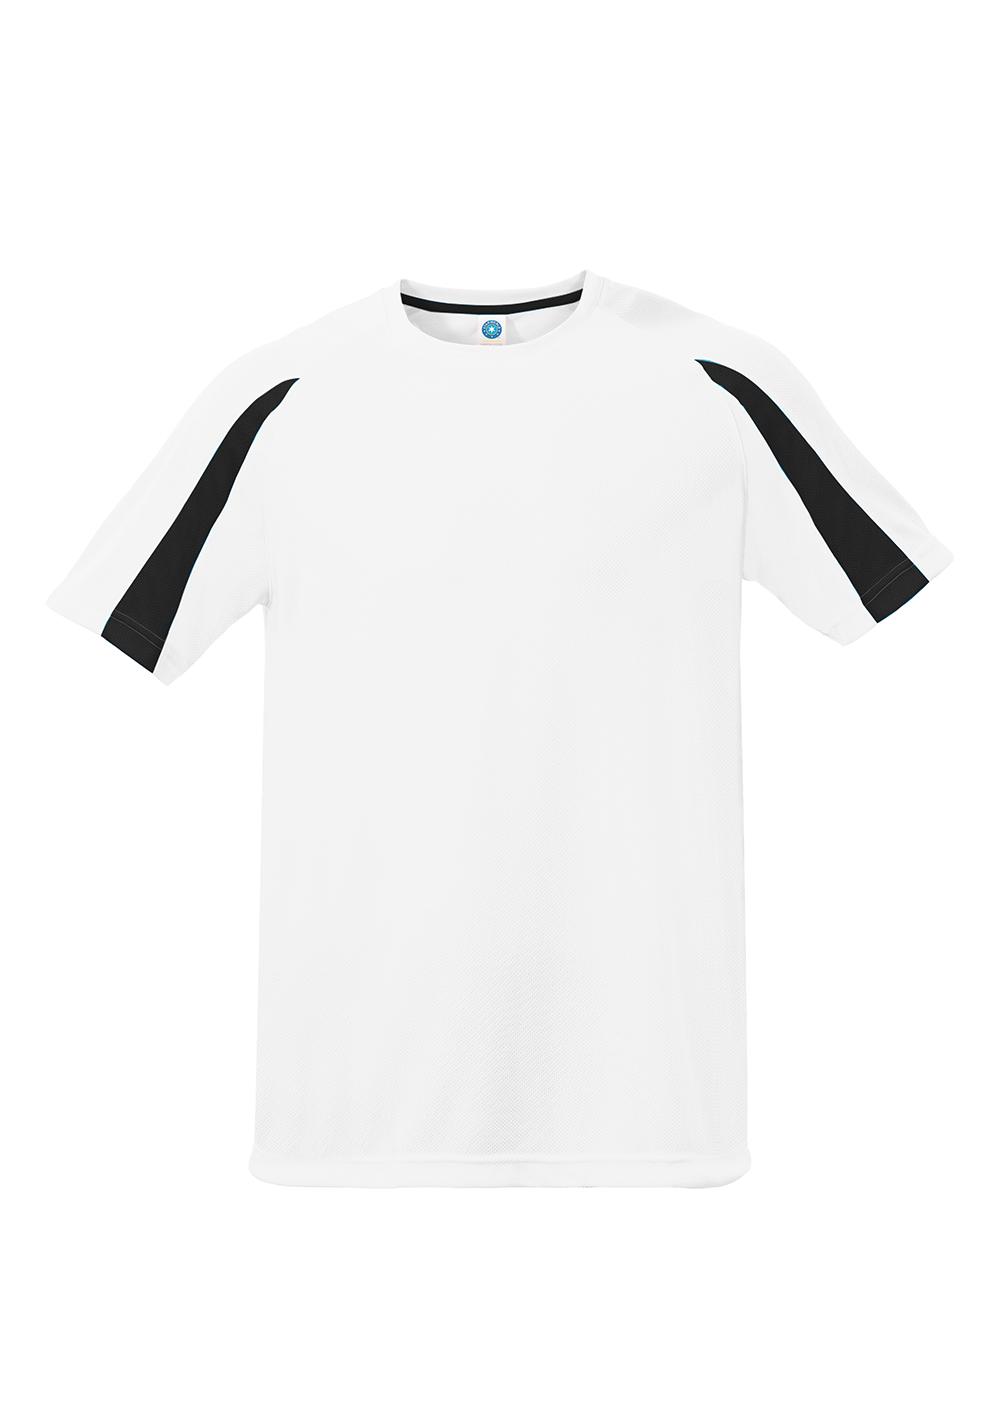 SW309-03-17-White-Black.png